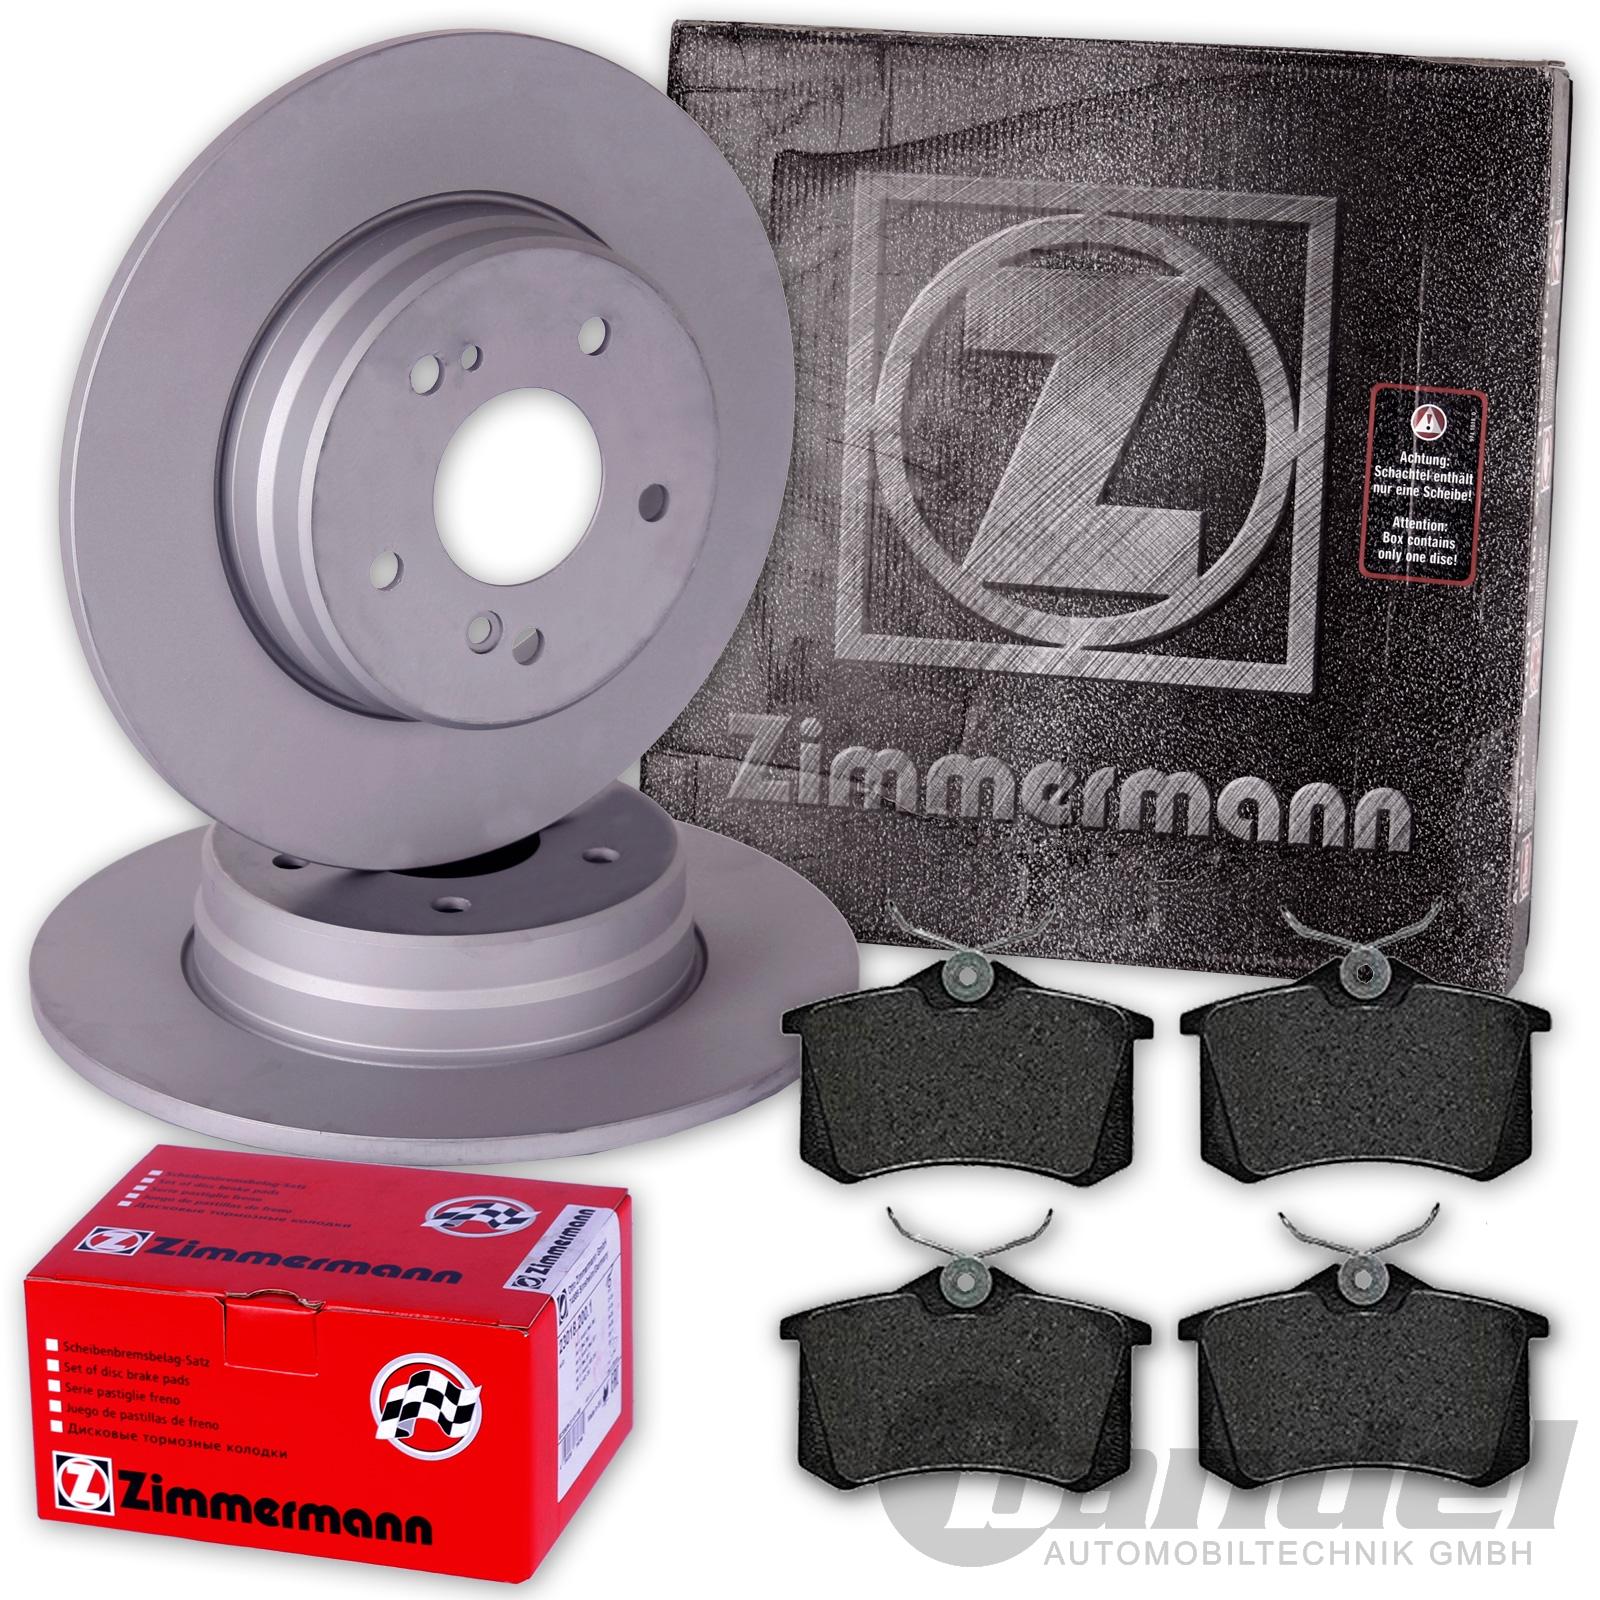 zimmermann bremsscheiben 245mm bel ge hinten audi a4 8e. Black Bedroom Furniture Sets. Home Design Ideas